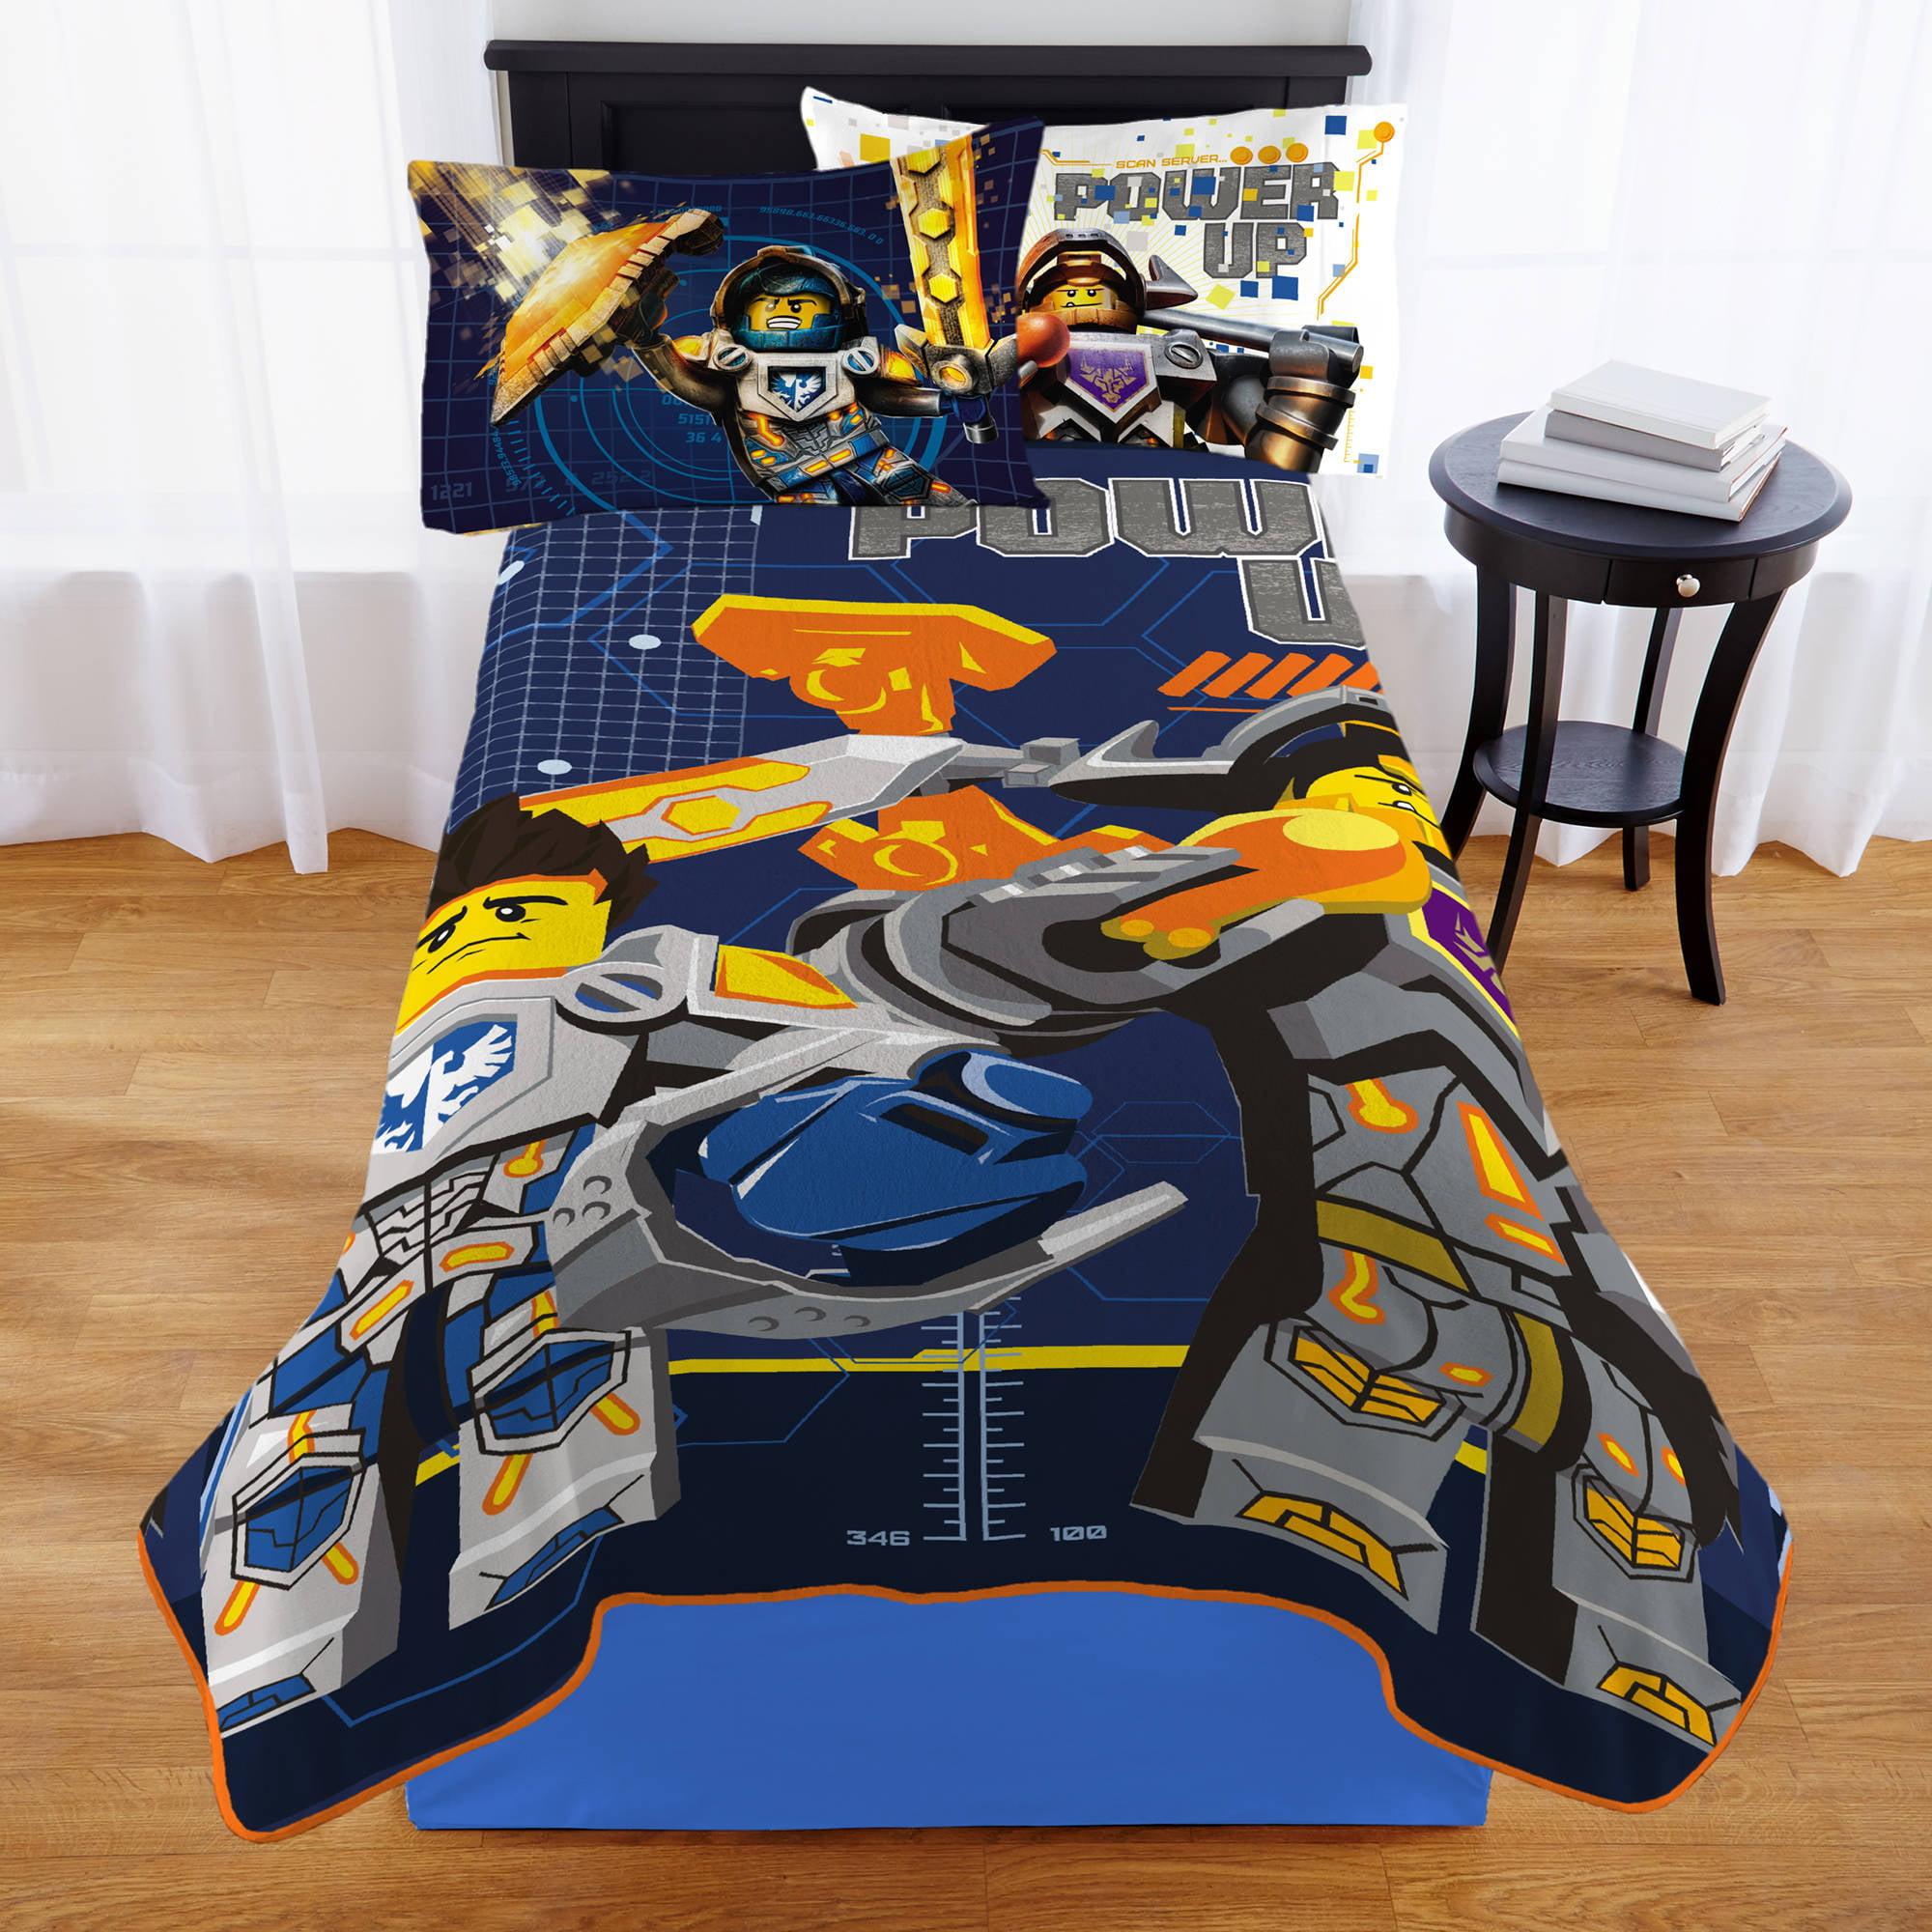 Lego Nexo Knight 'Heroic' Plush Blanket - Walmart.com